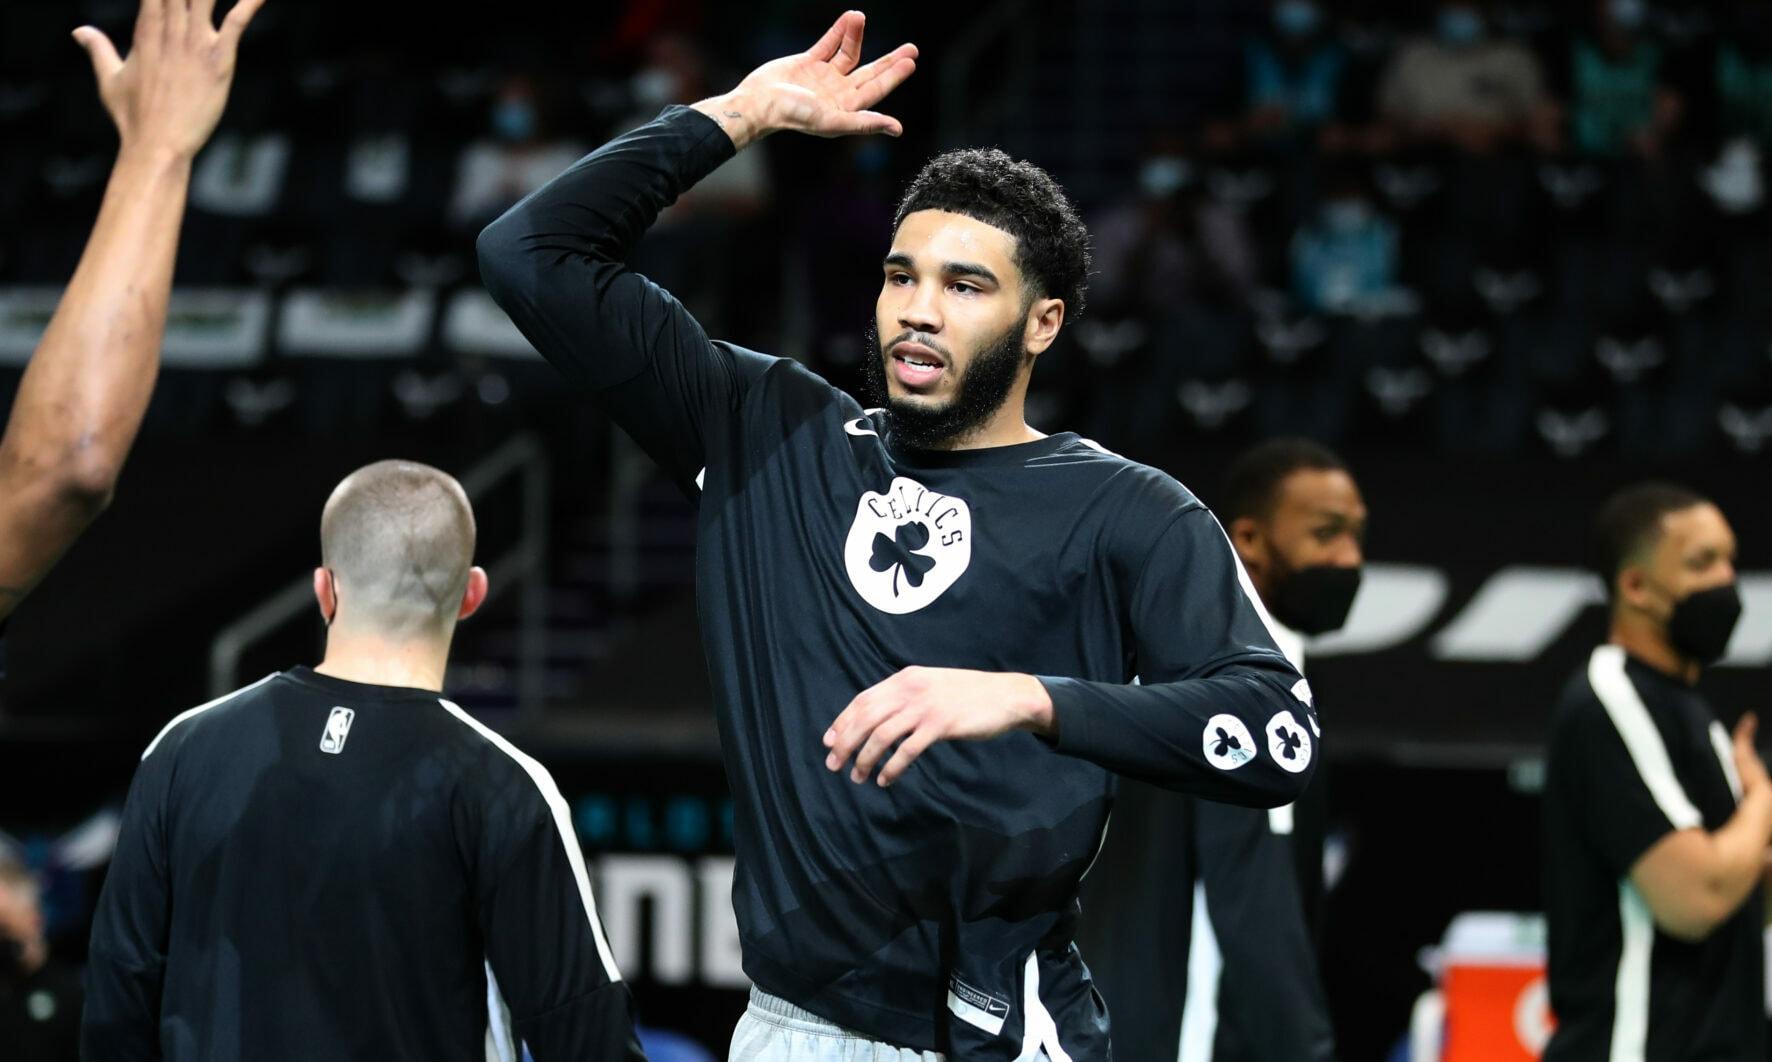 Celtics visit Magic, look to climb up standings